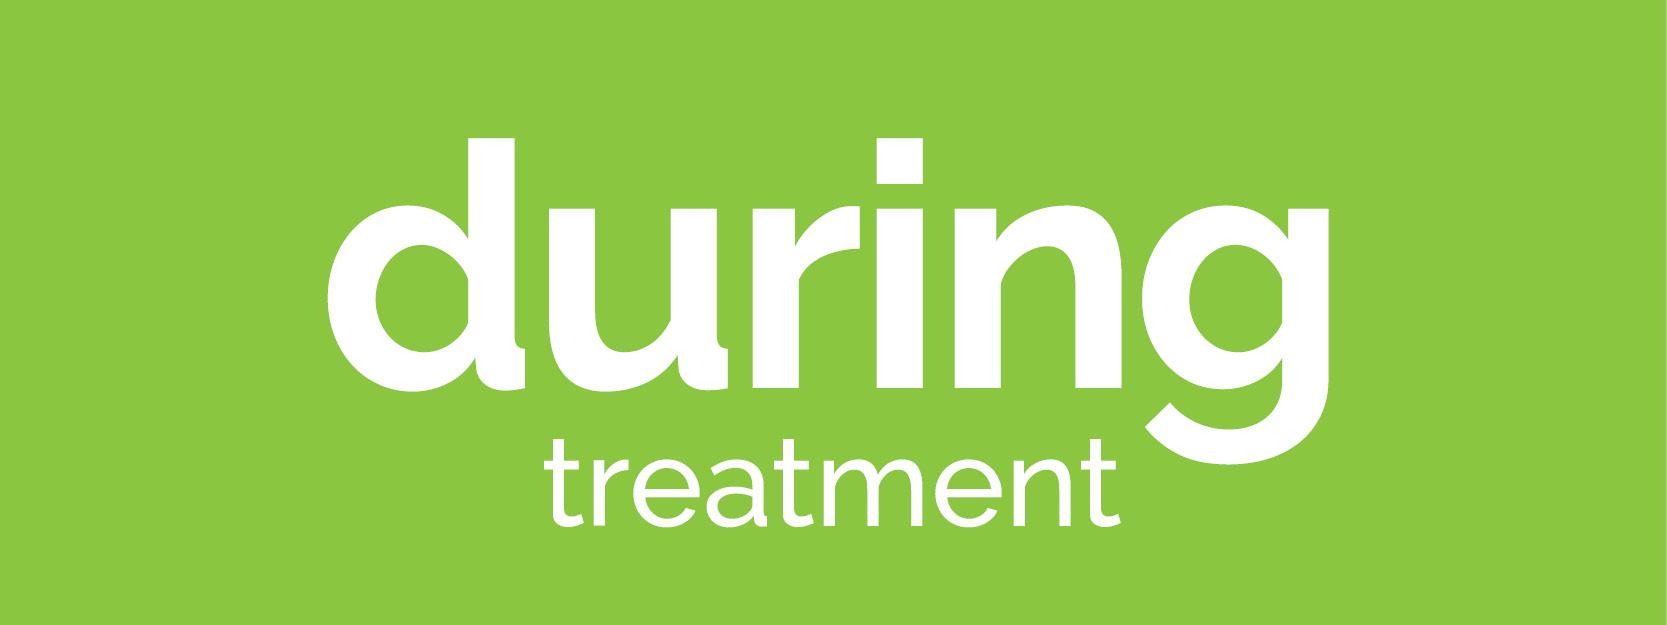 during treatment.pdf